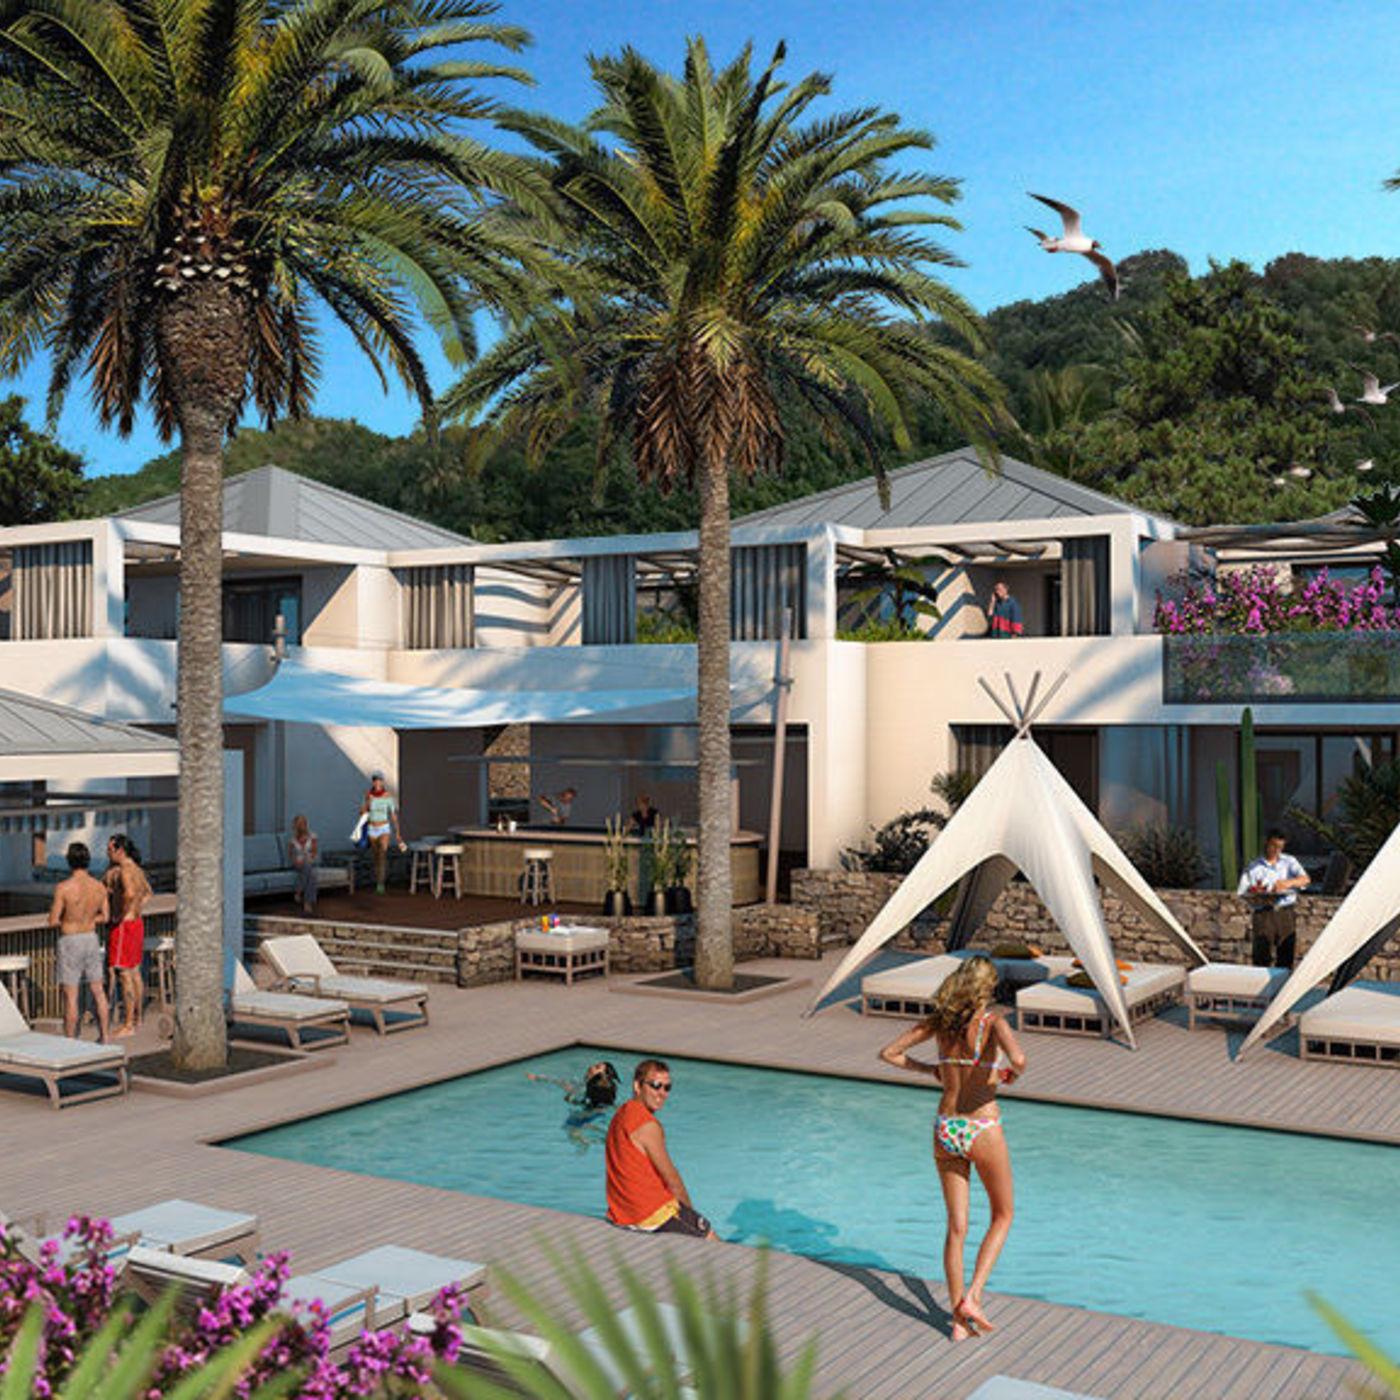 Resort project in St Barthelemy island scene